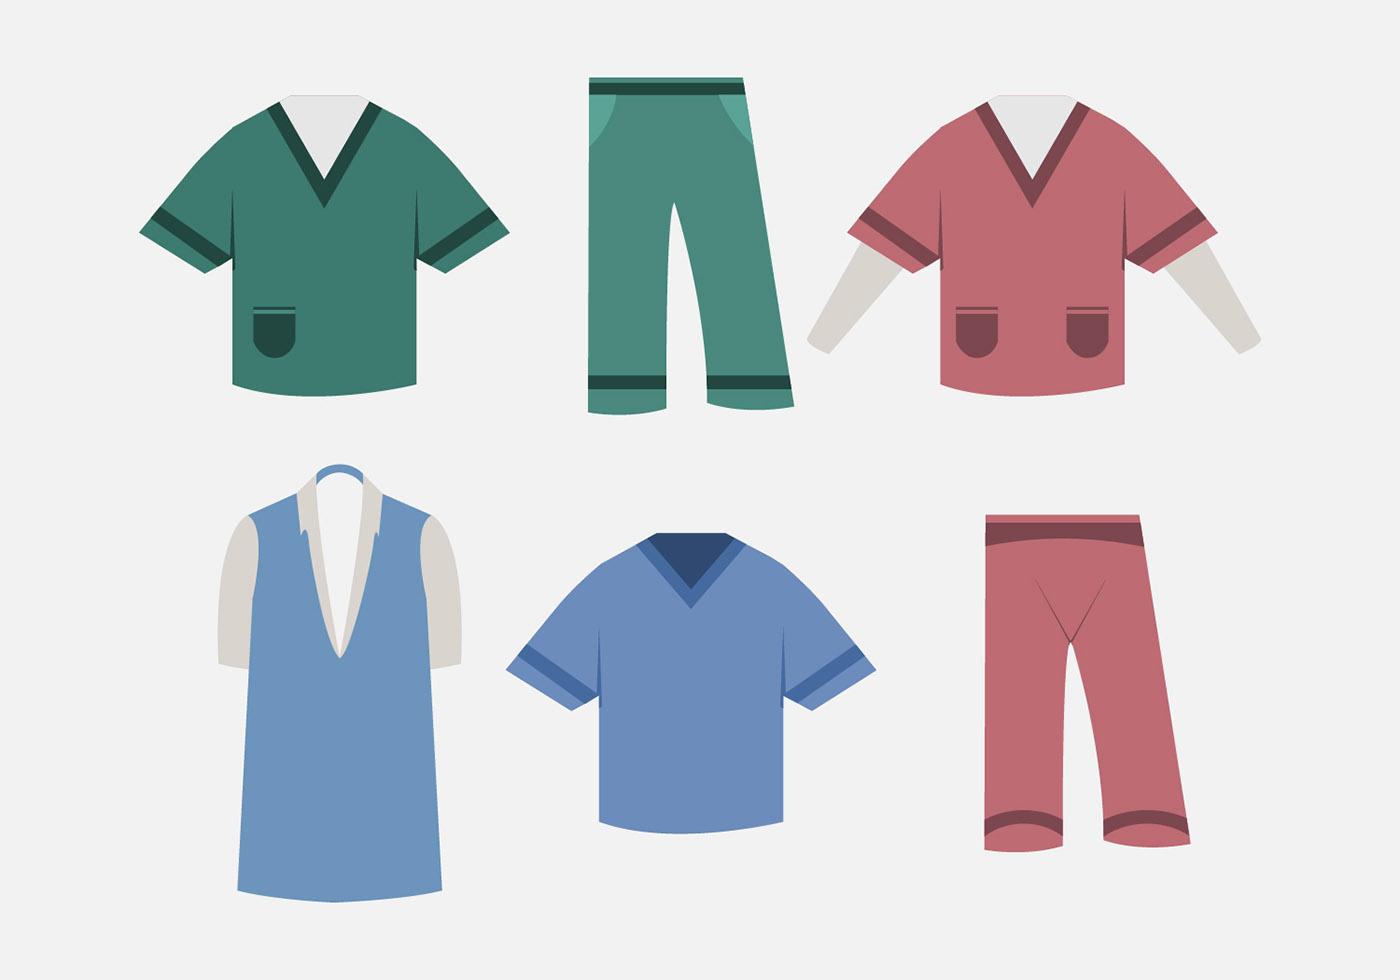 1400x980 Nurse Scrubs Free Vector Art